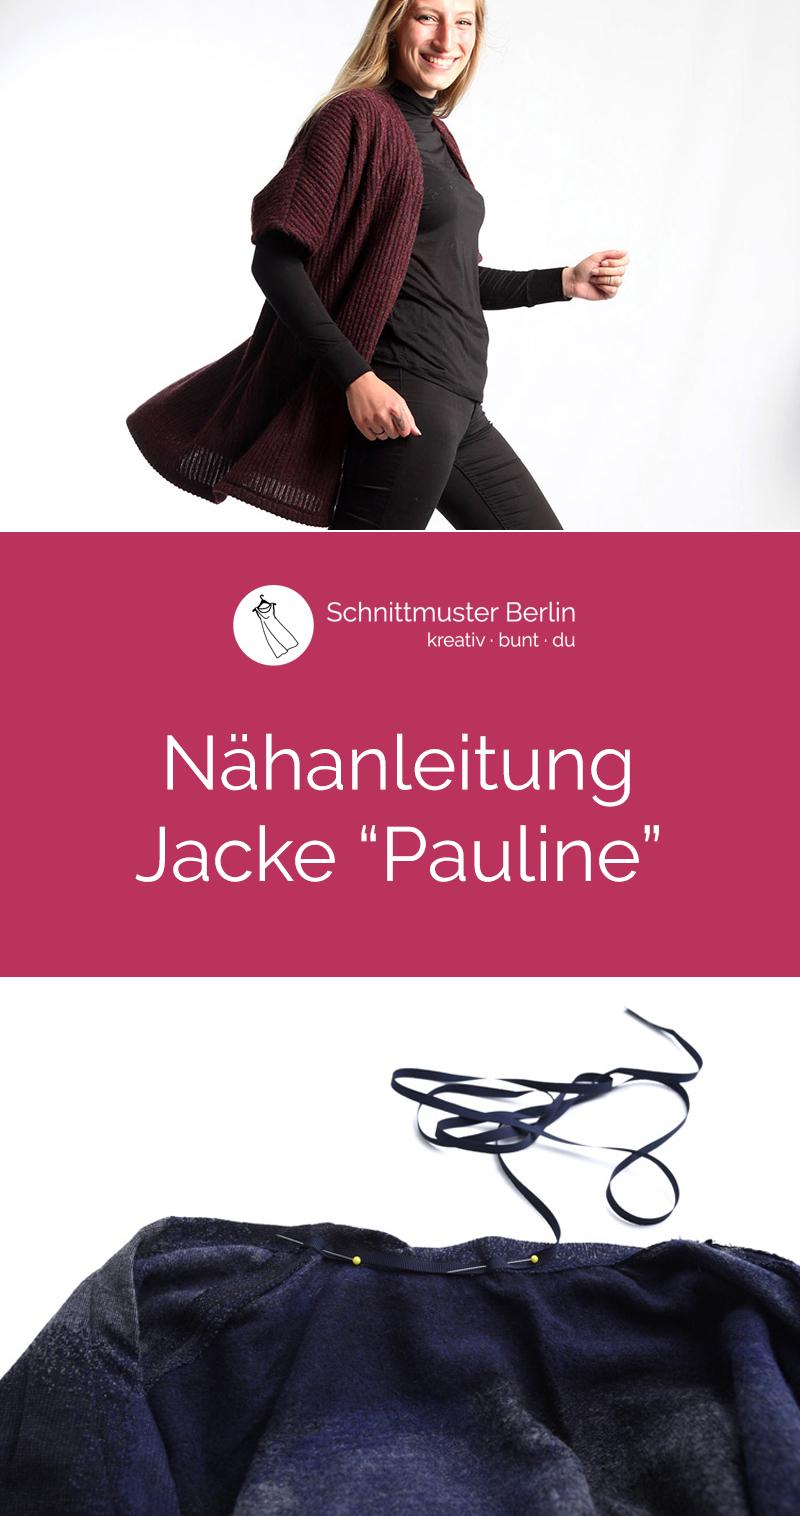 "Nähanleitung für die Jacke ""Pauline"""